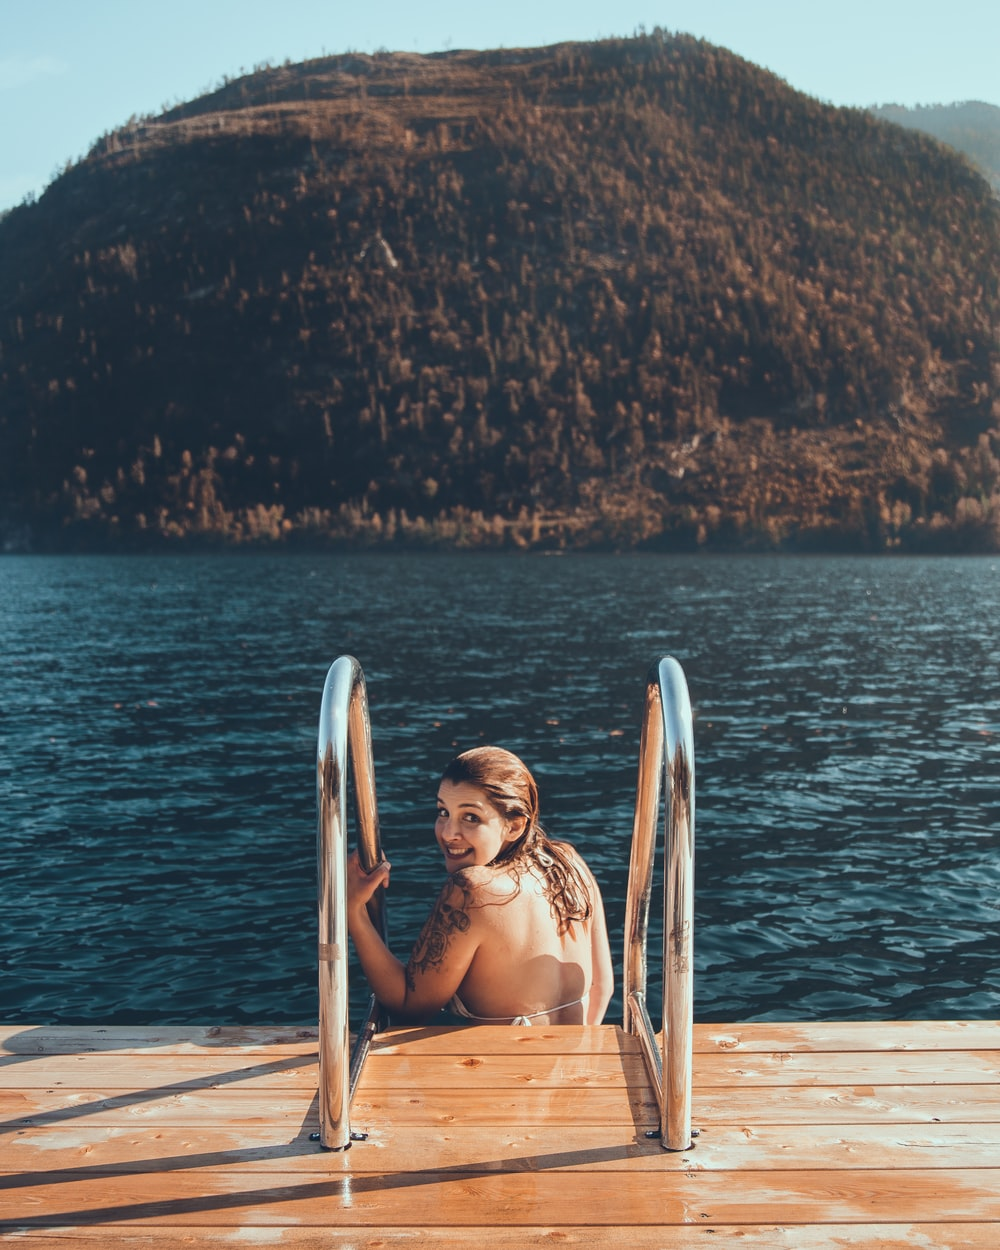 woman wearing white bra sitting on stairs near body of water